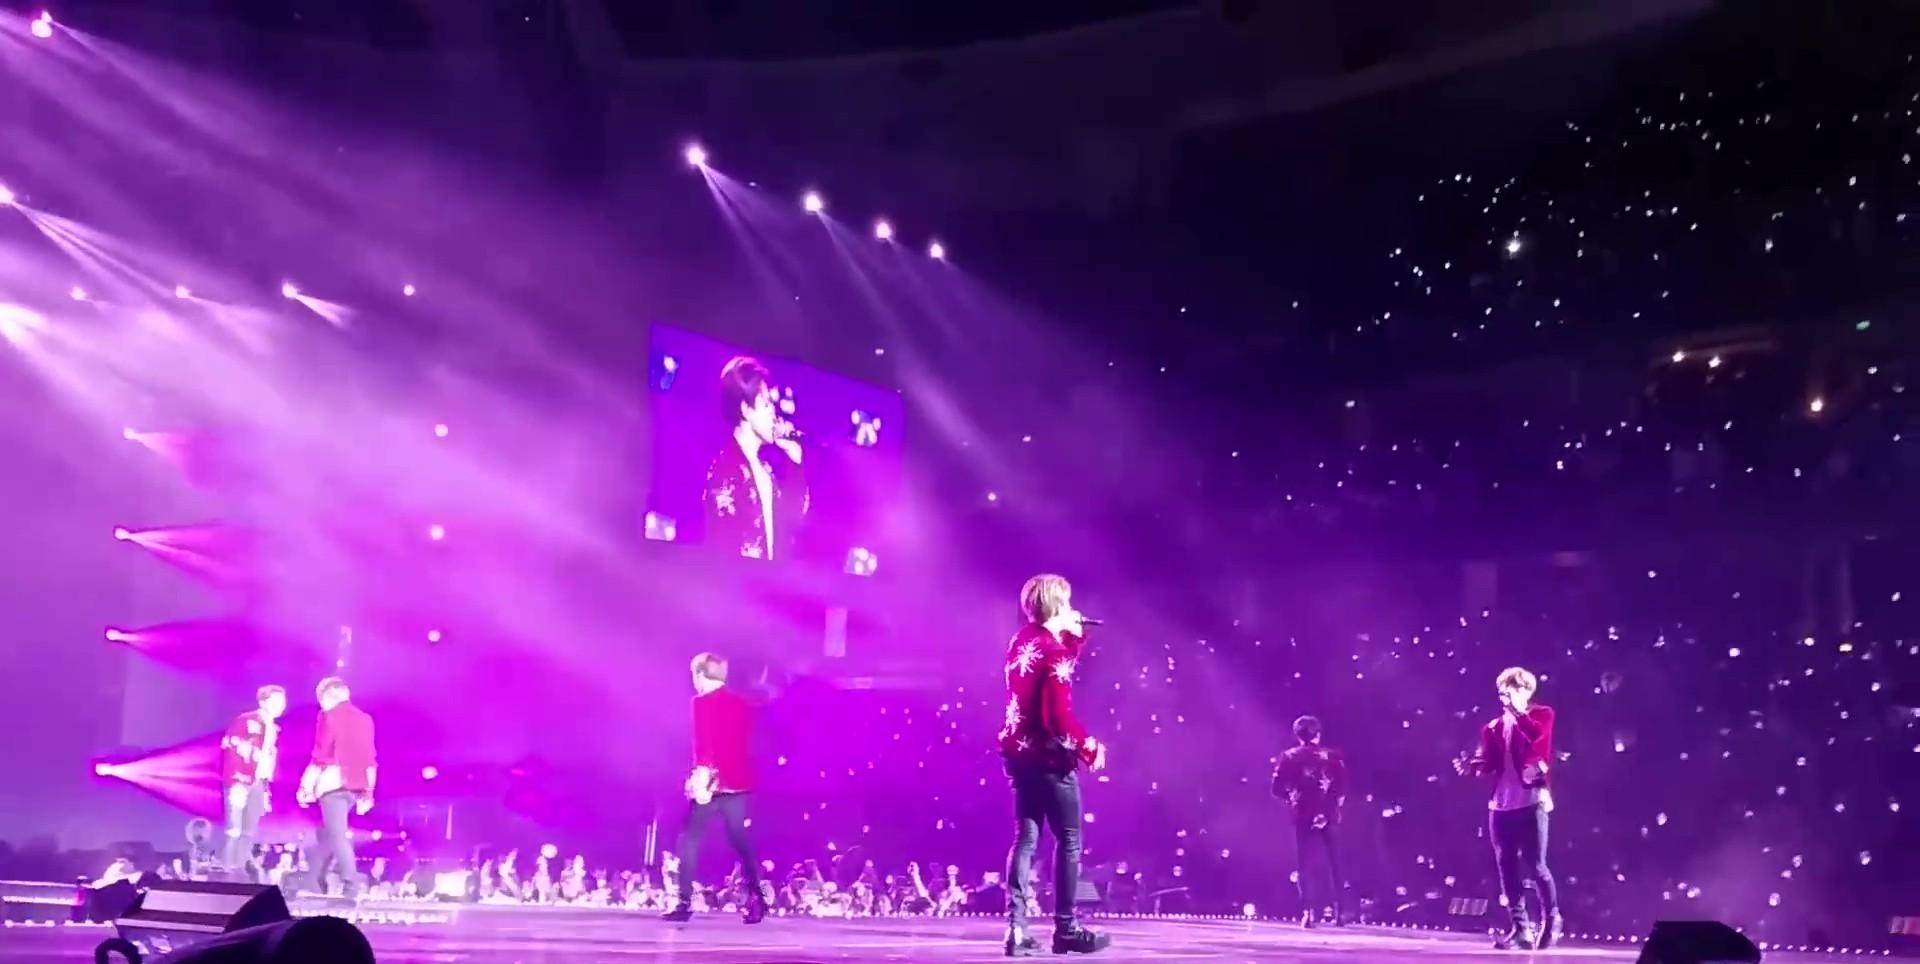 File:BTS performing